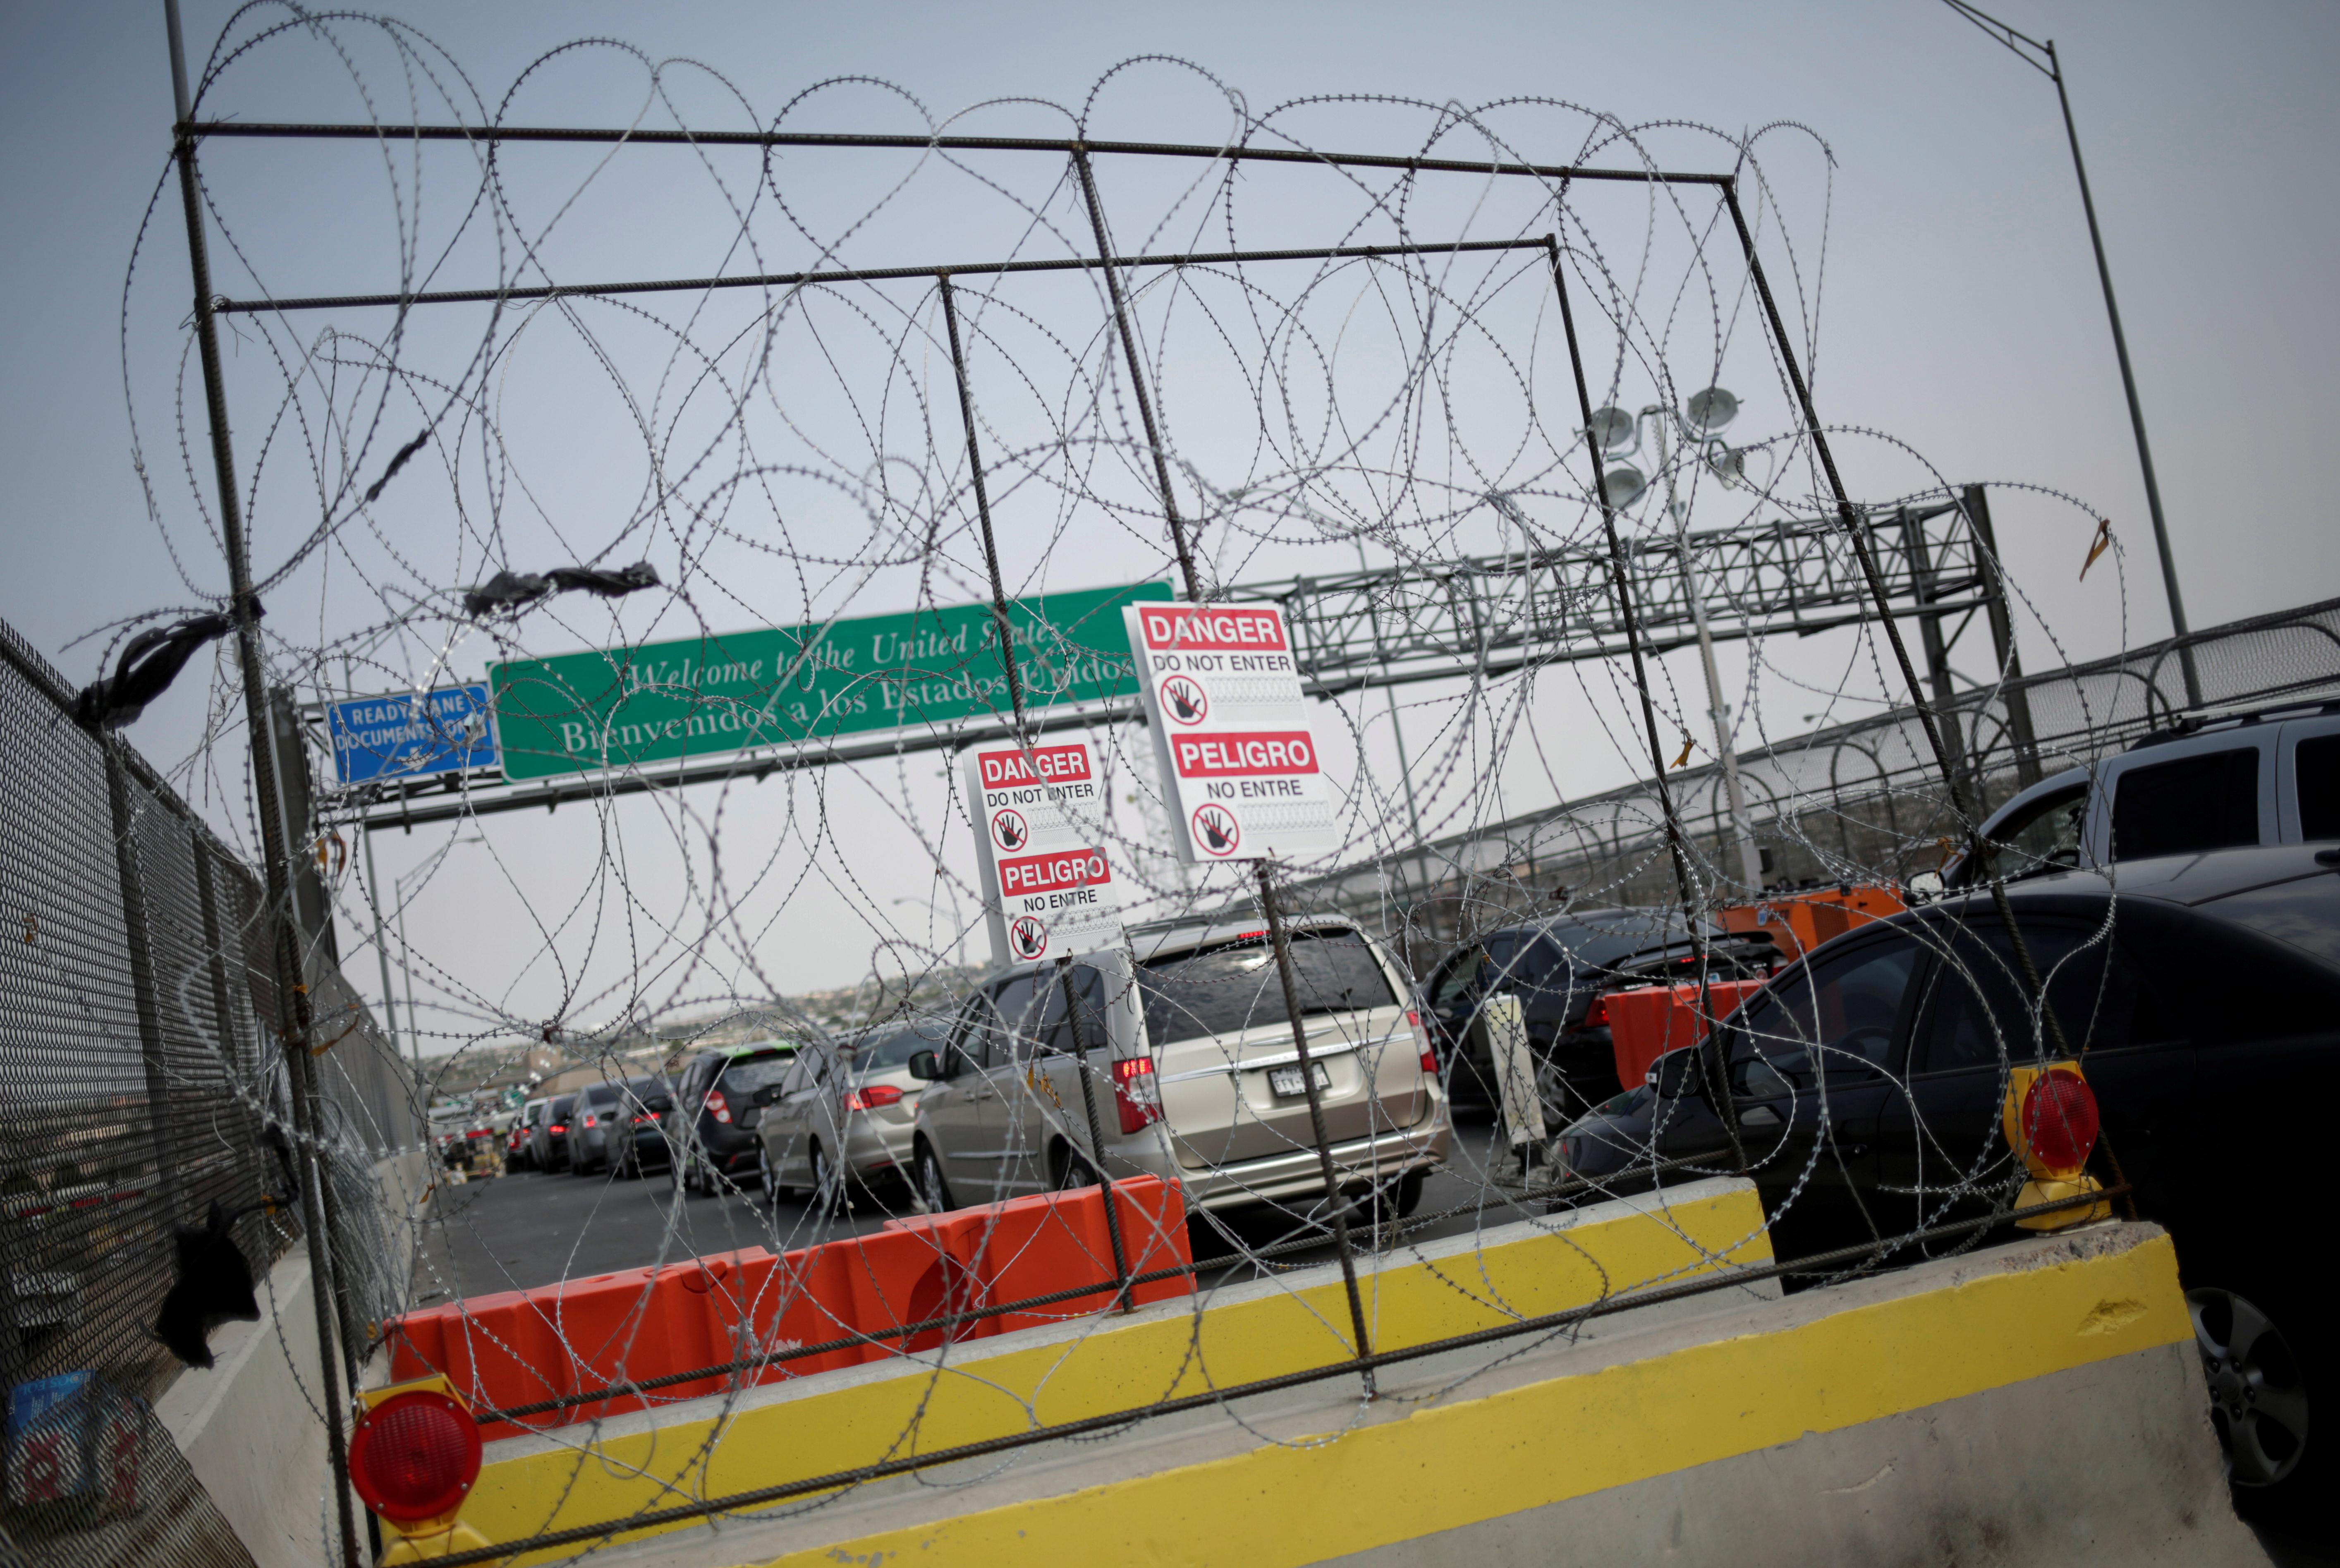 Cars stand in line at the Cordova International Bridge at the Mexico-U.S. border to enter into El Paso, Texas, in Ciudad Juarez, Mexico August 24, 2020. REUTERS/Jose Luis Gonzalez/File Photo